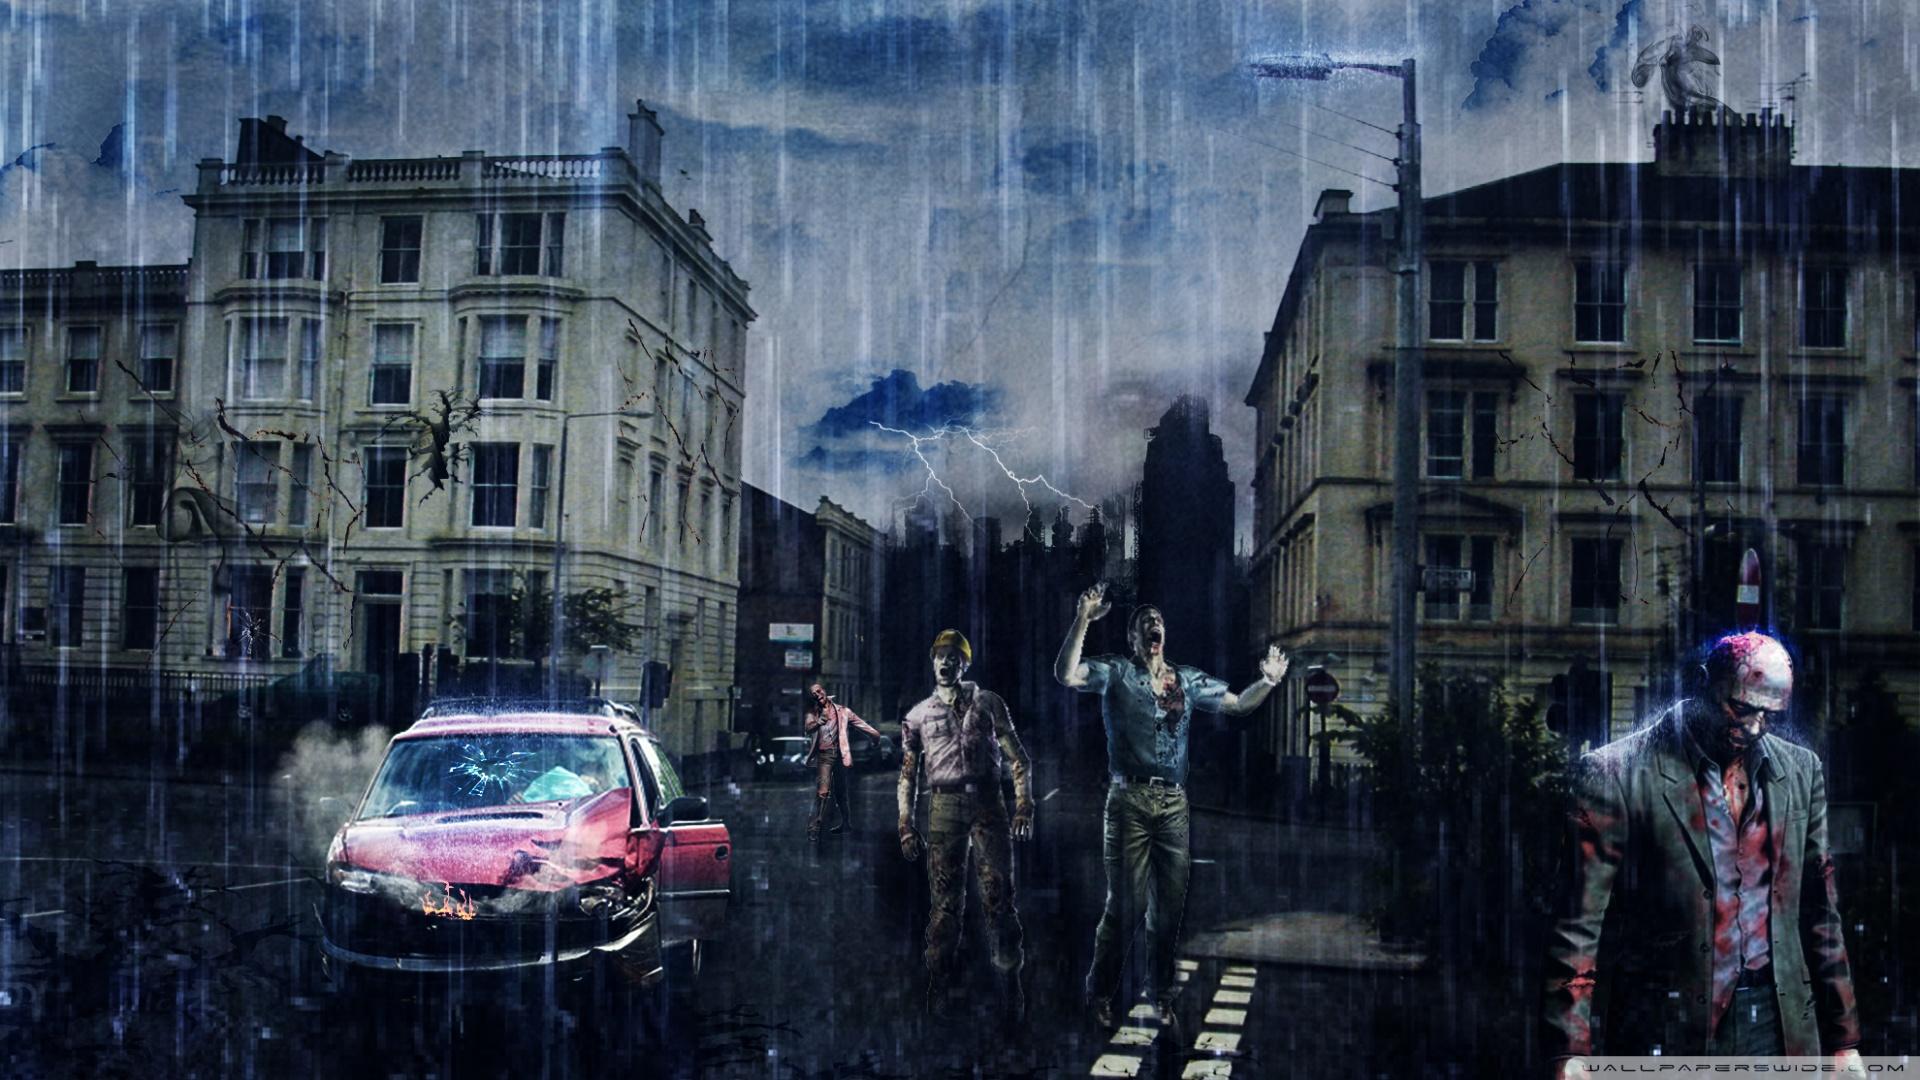 Zombie Apocalypse Wallpaper - WallpaperSafari